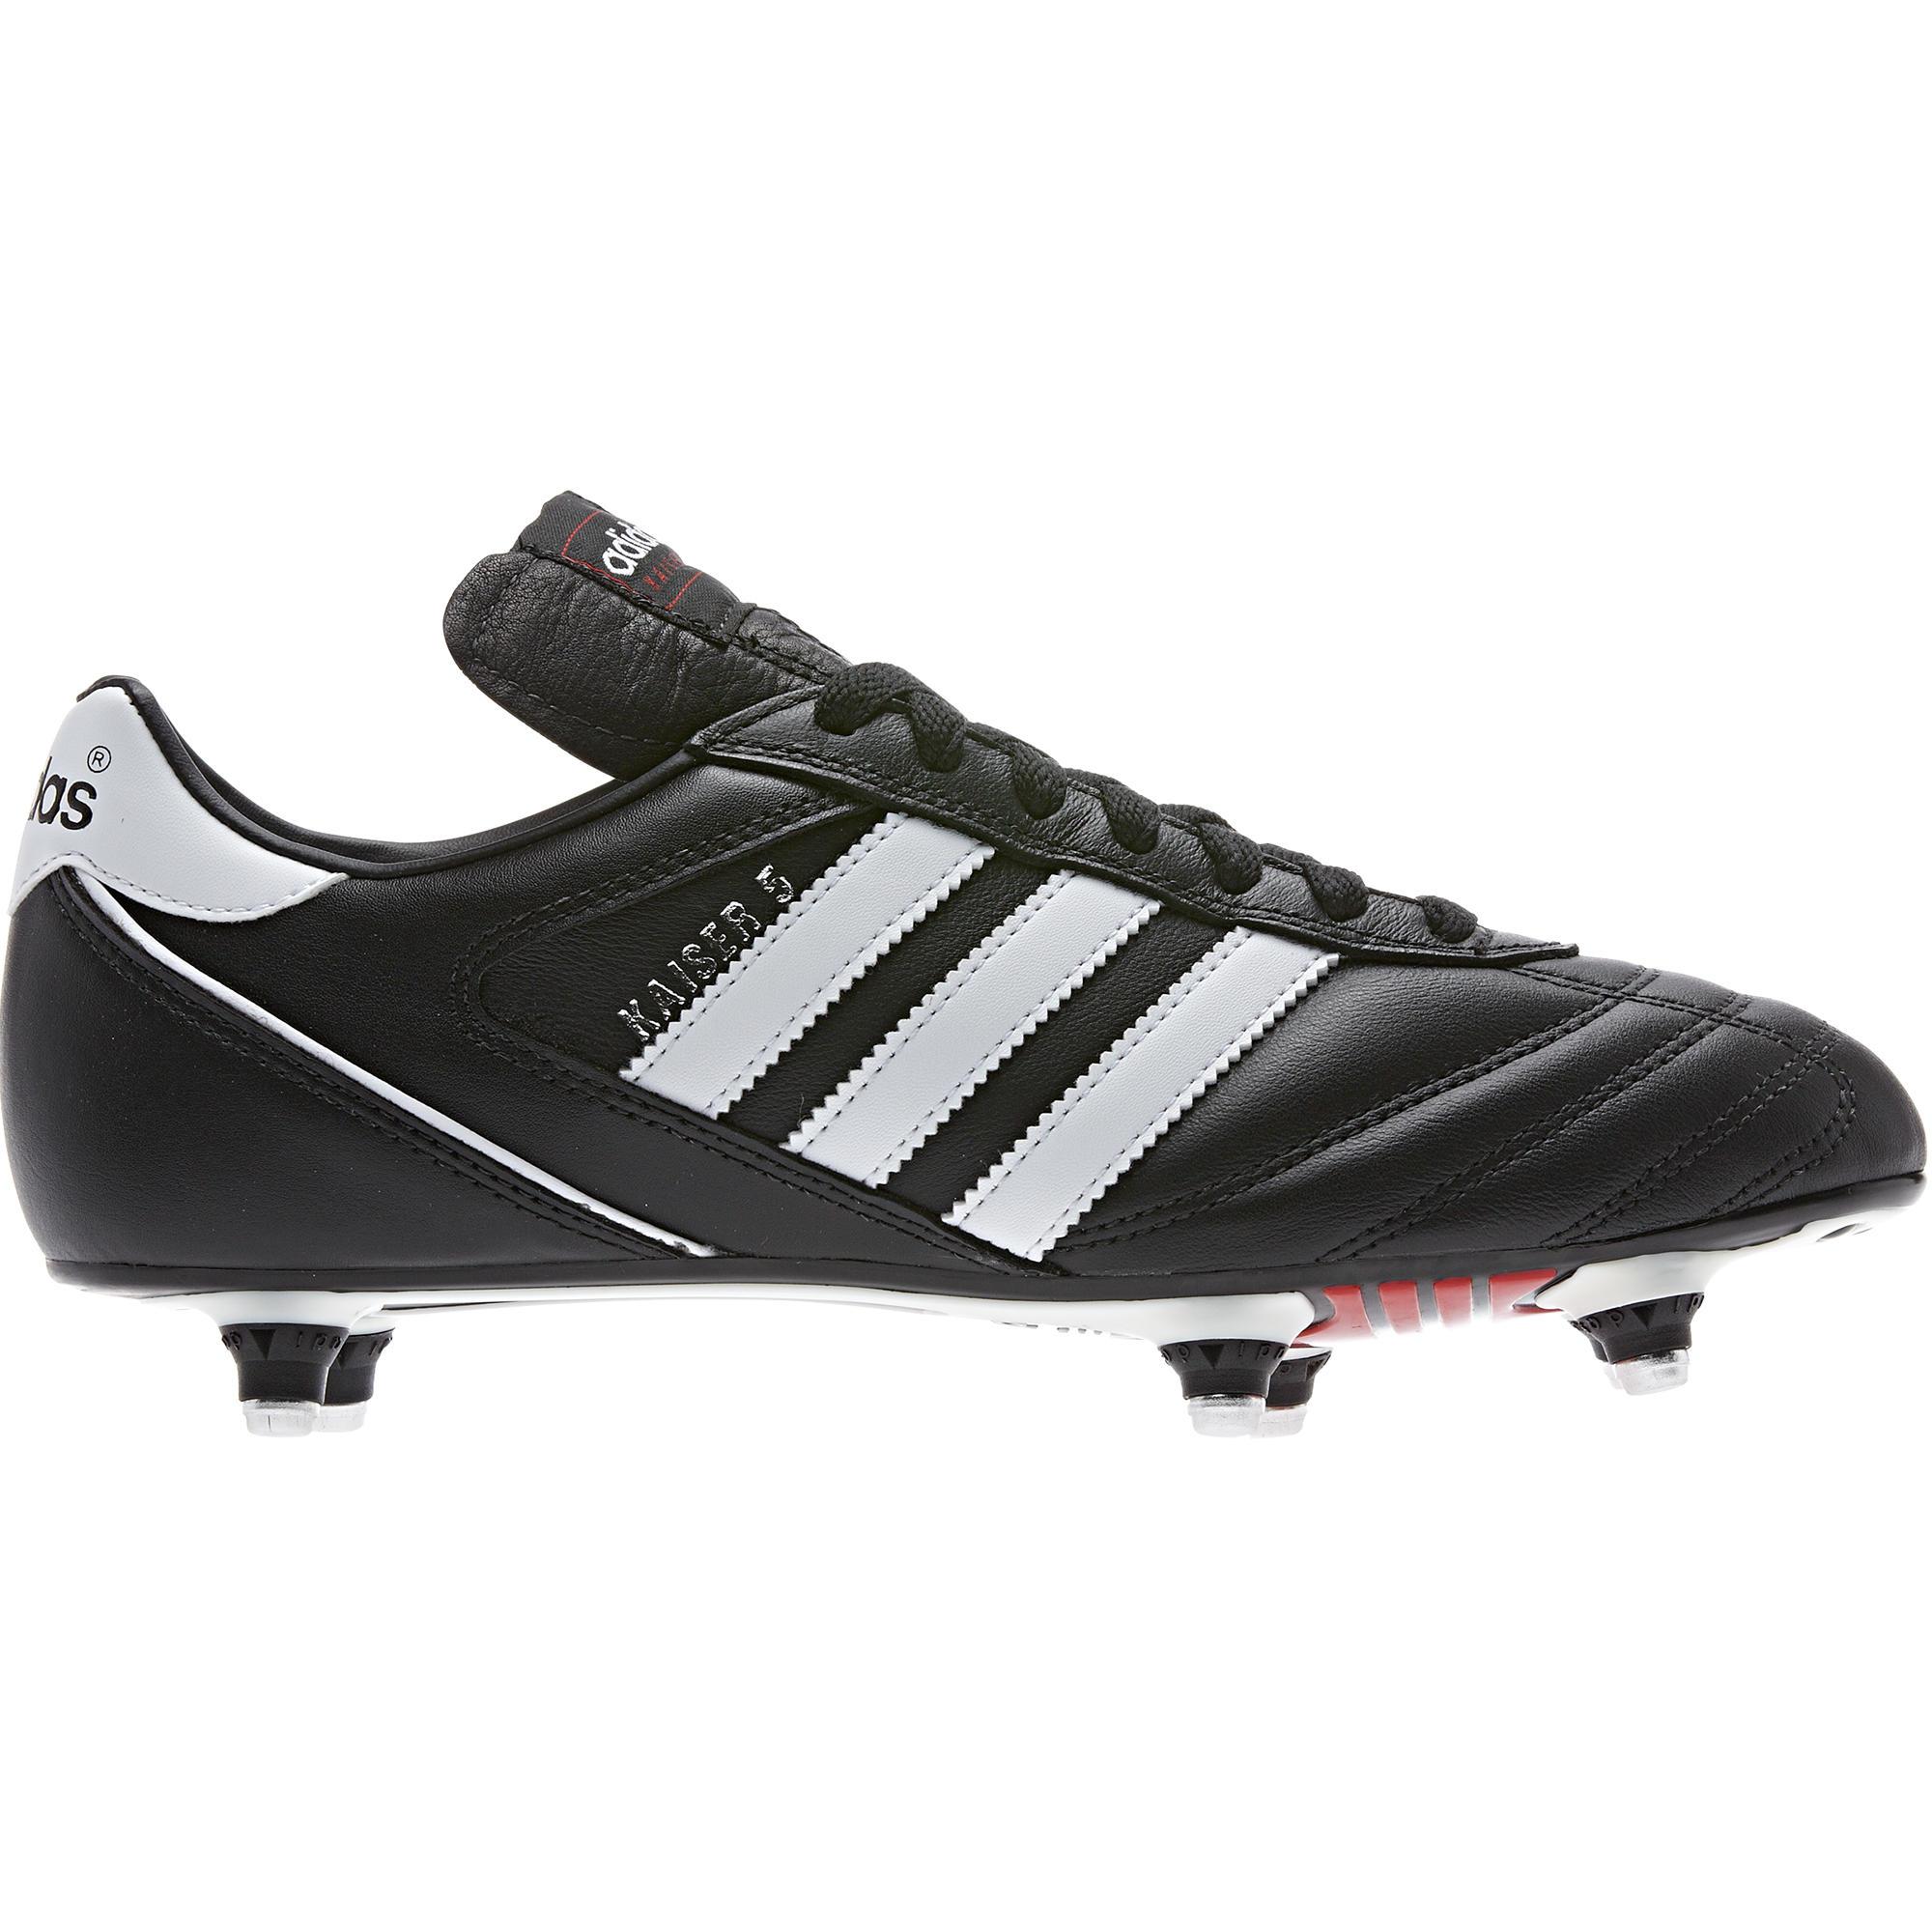 Crampons Adidas, chaussures de foot Adidas, crampons de foot ...